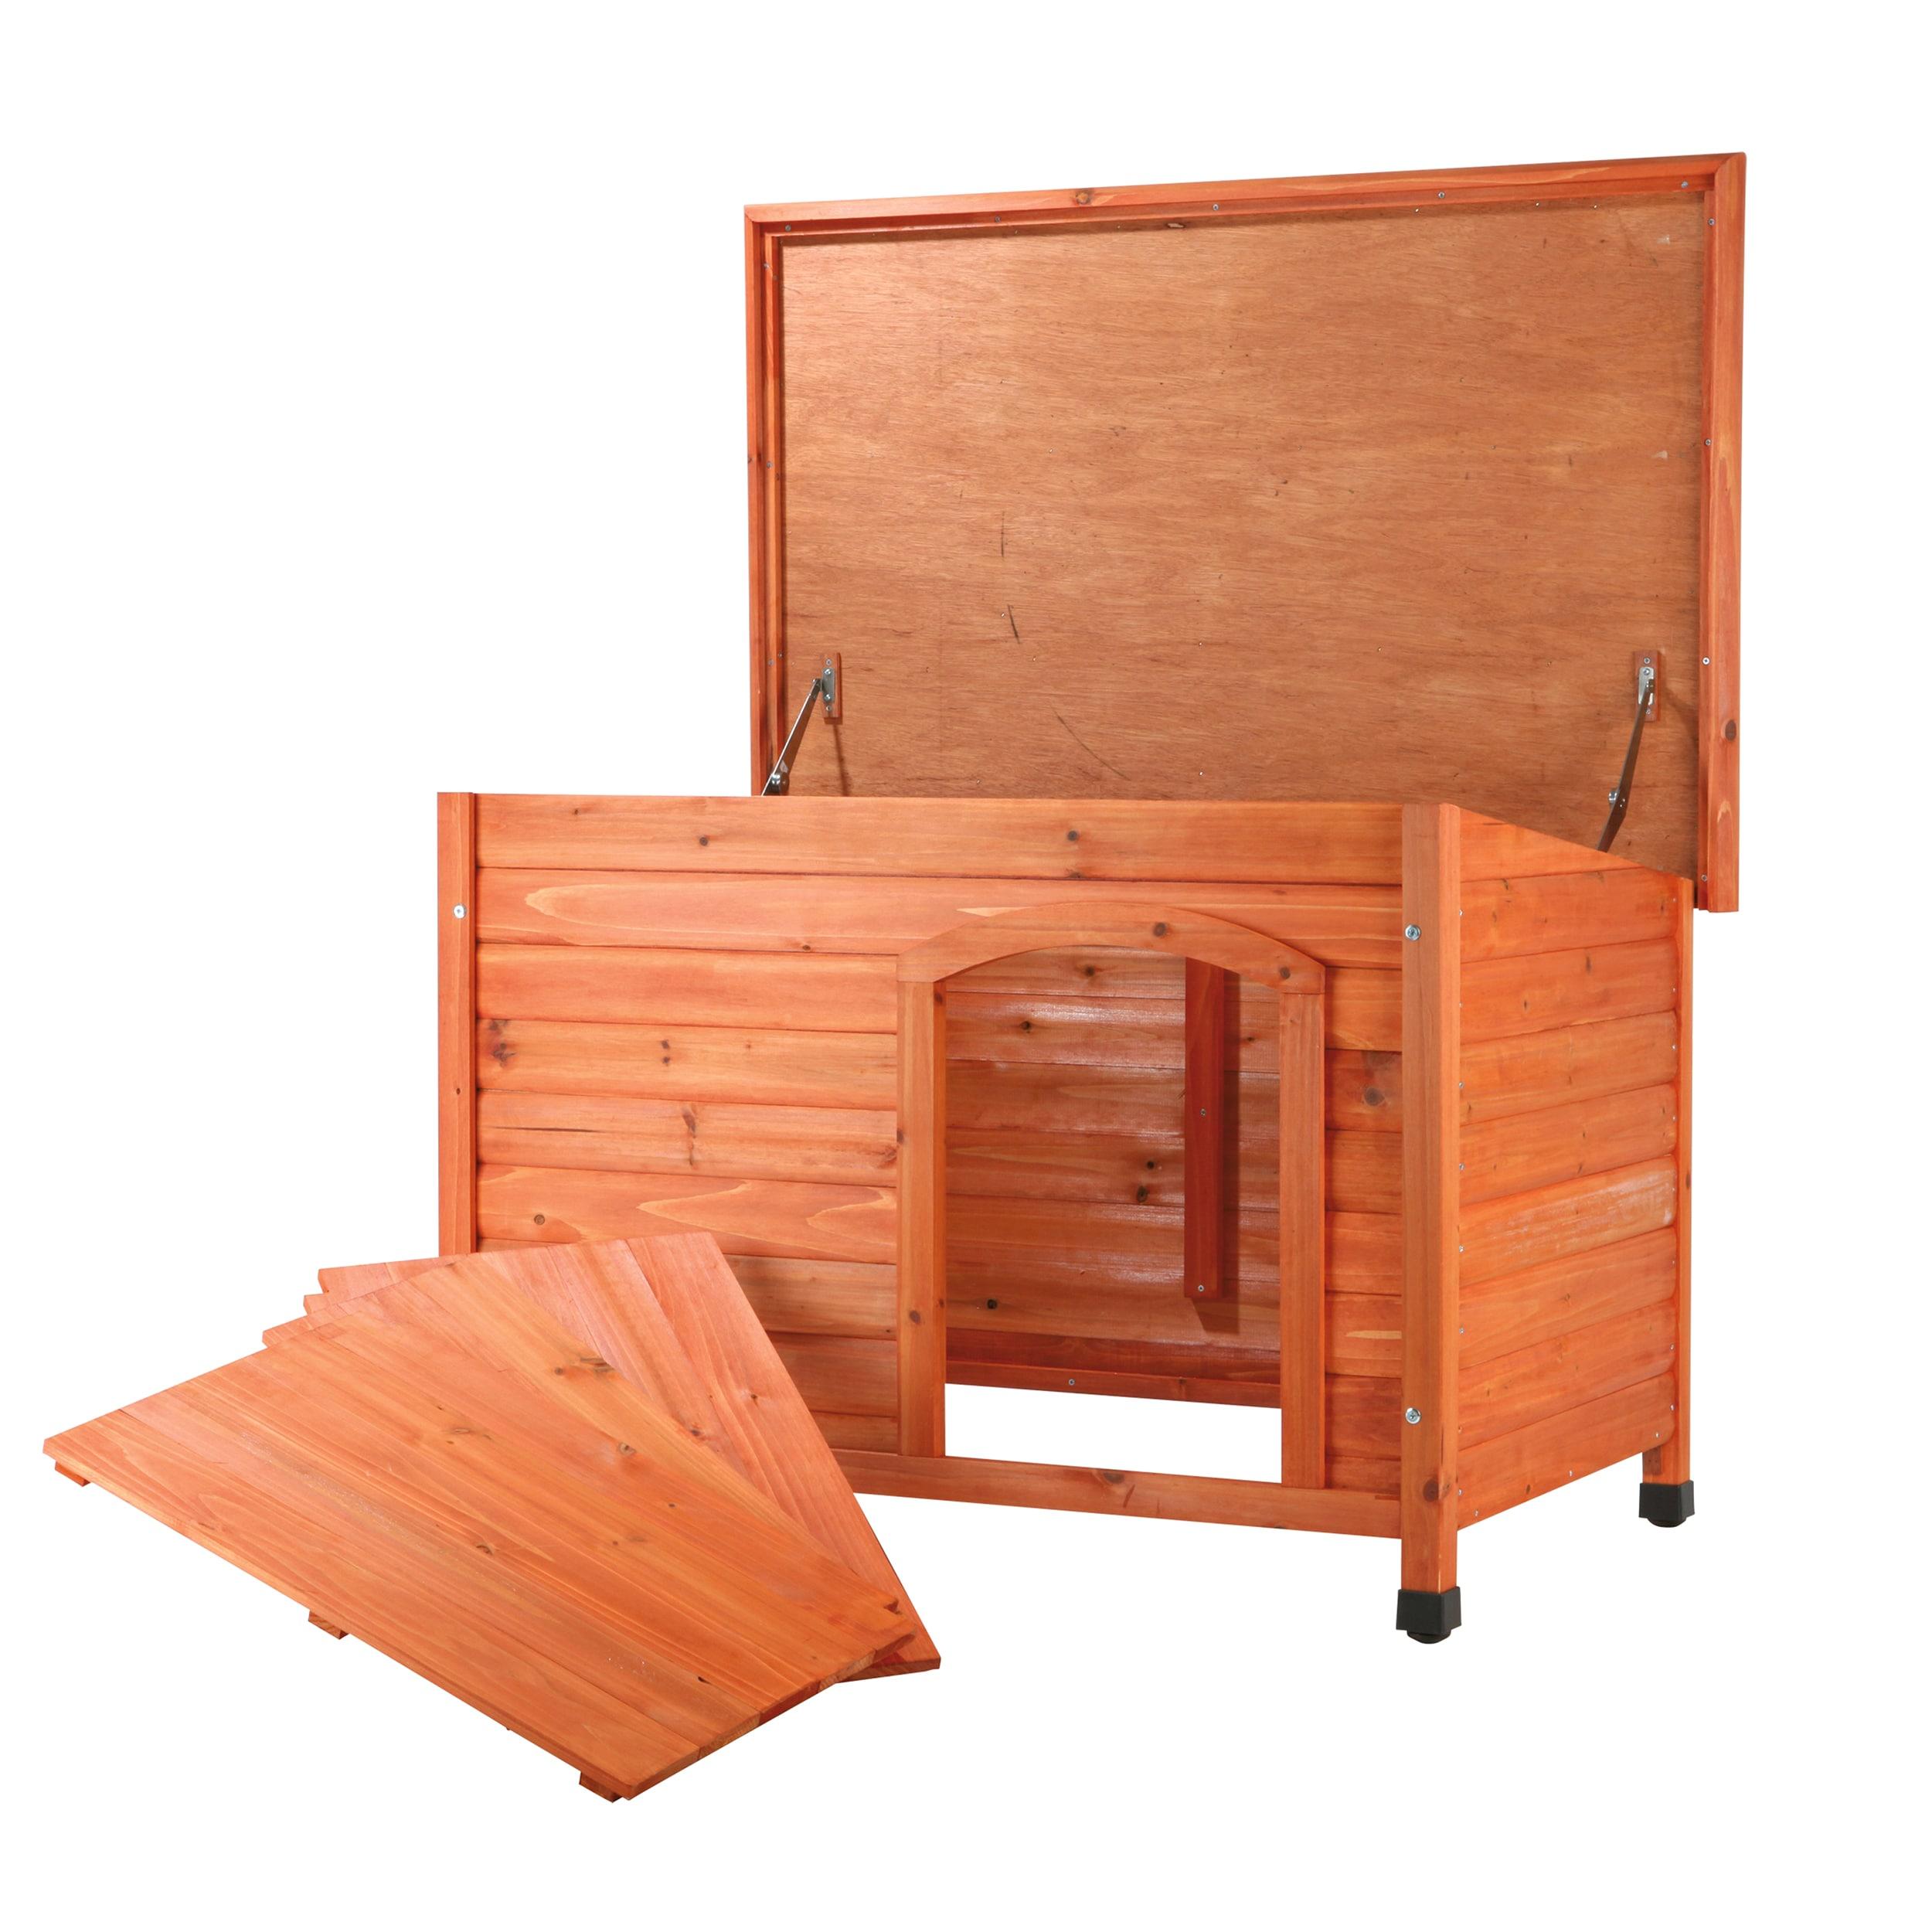 Trixie Natura Medium Weatherproof Flat Roof Glazed Pine Doghouse Free Shipping Today 6141866